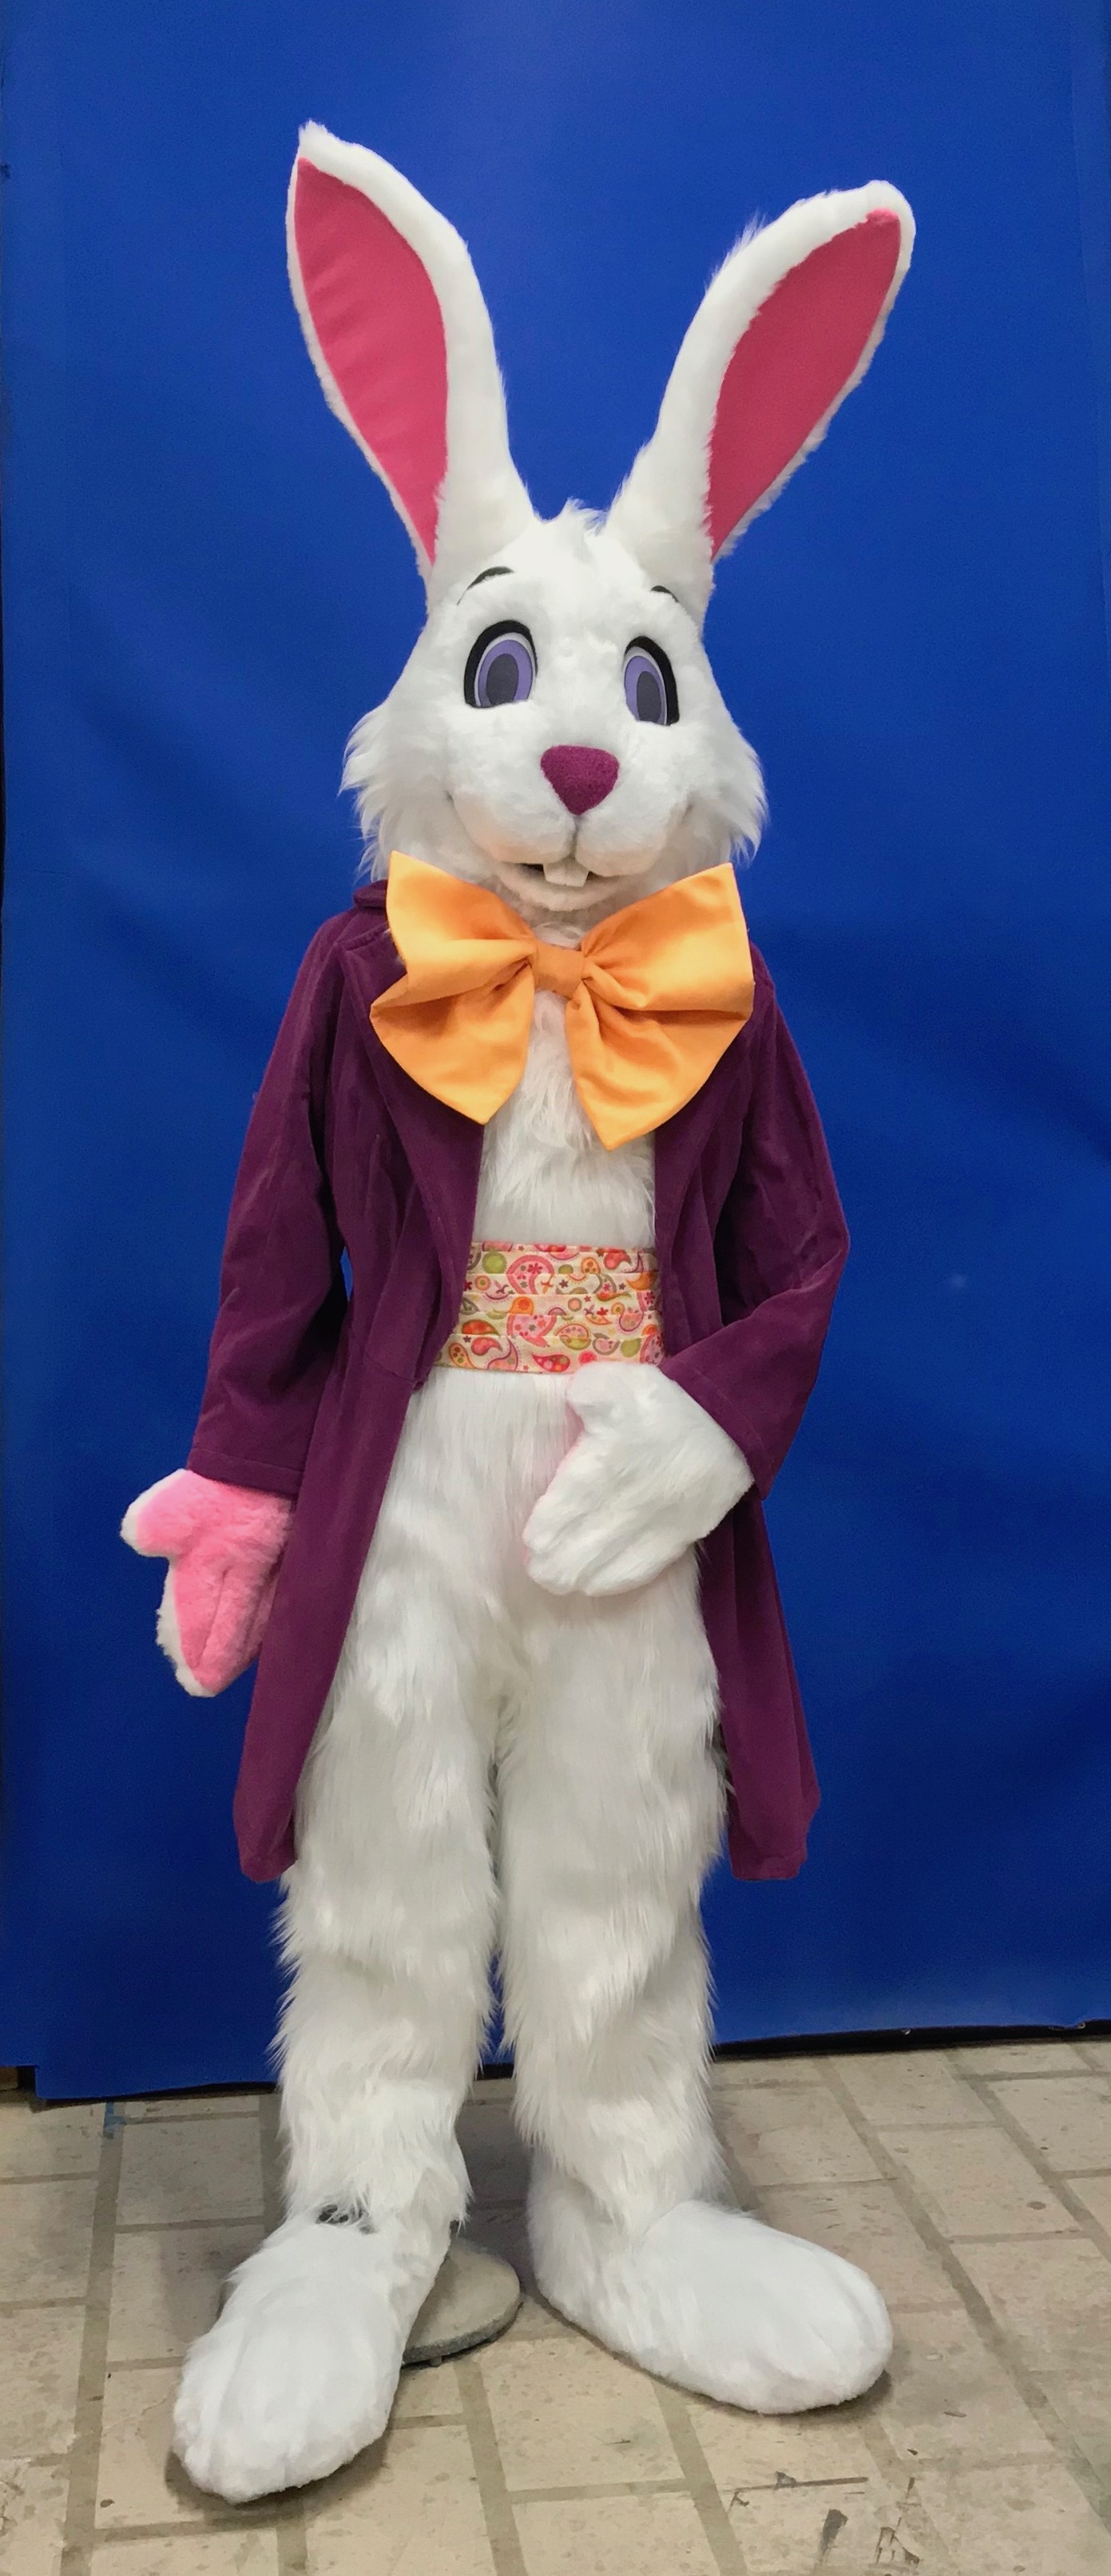 White Easter Bunny